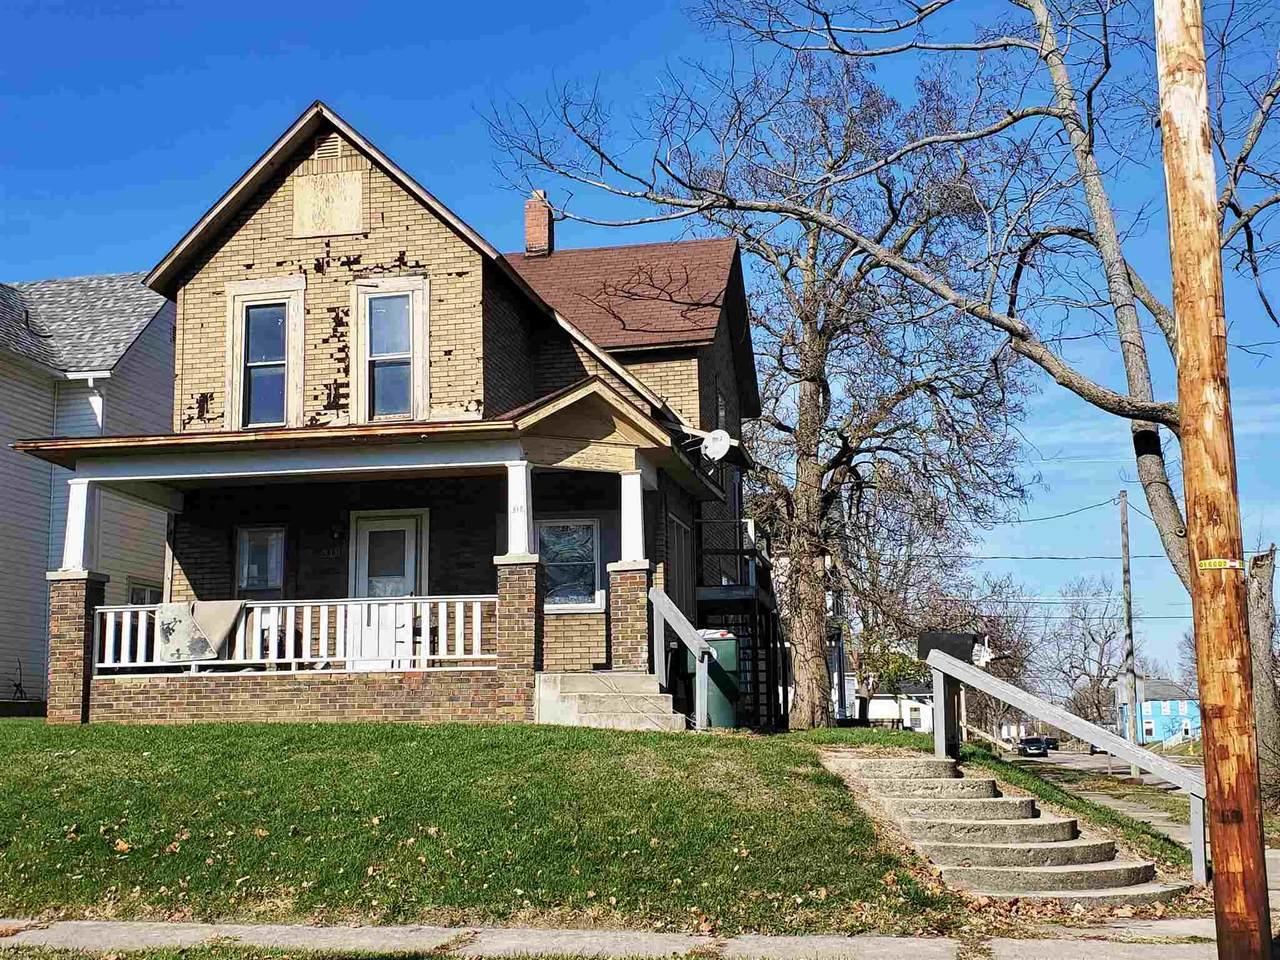 318 318 1/2 E 8th Street - Photo 1